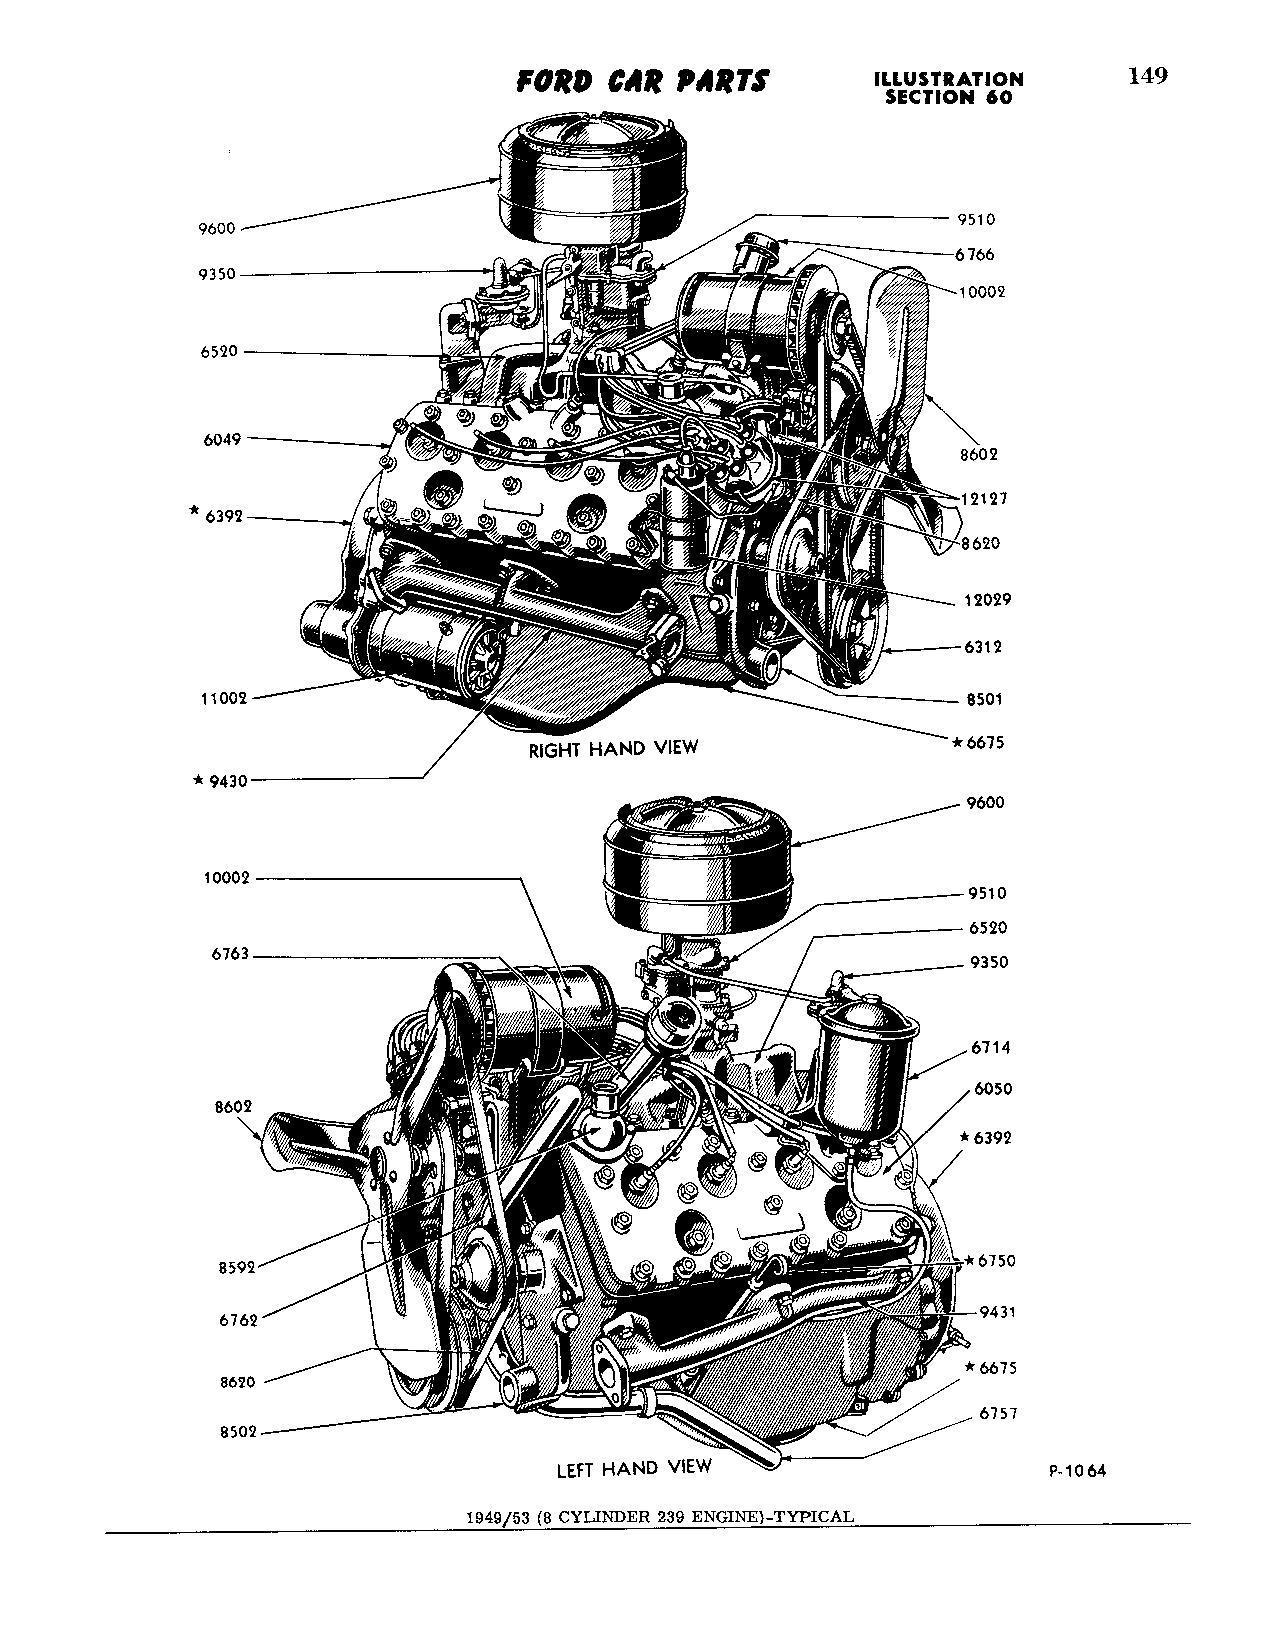 53 239 Exhaust Manifolds